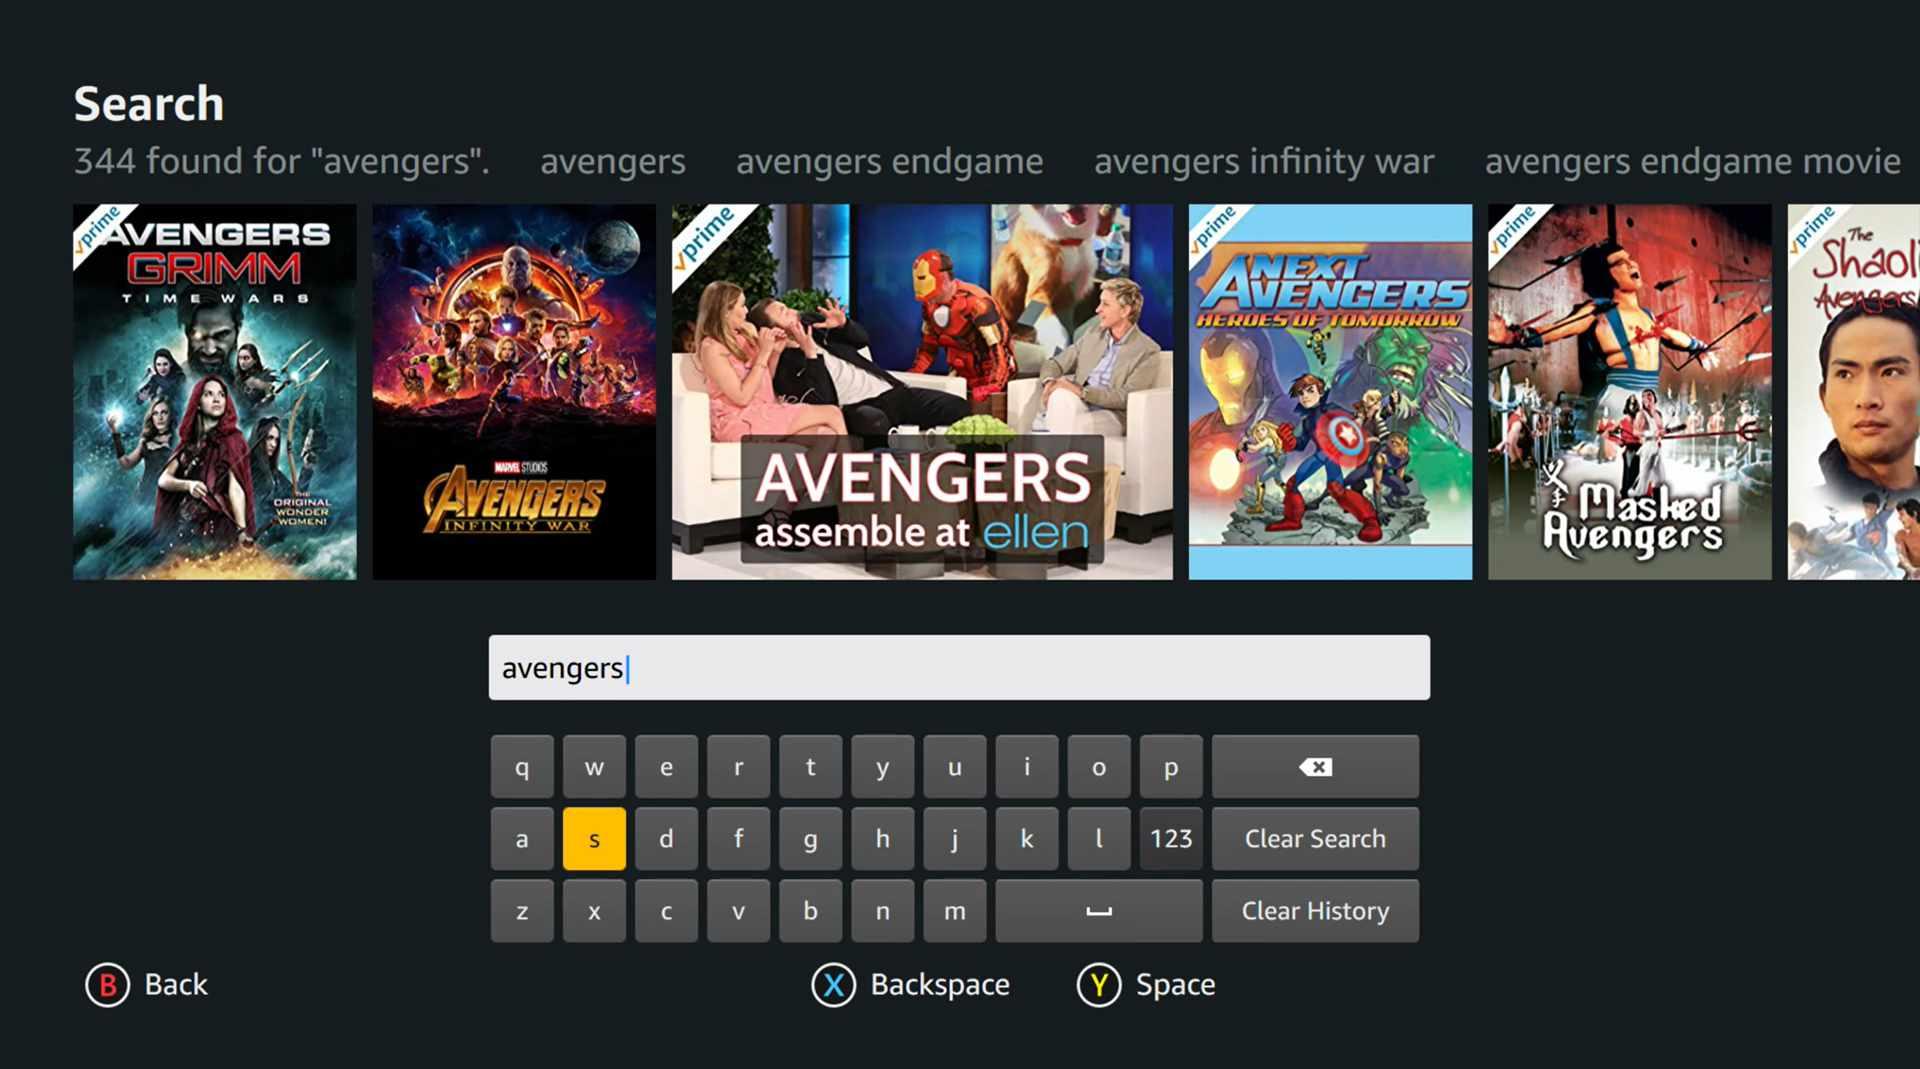 Amazon Prime Video app on Xbox One X console.